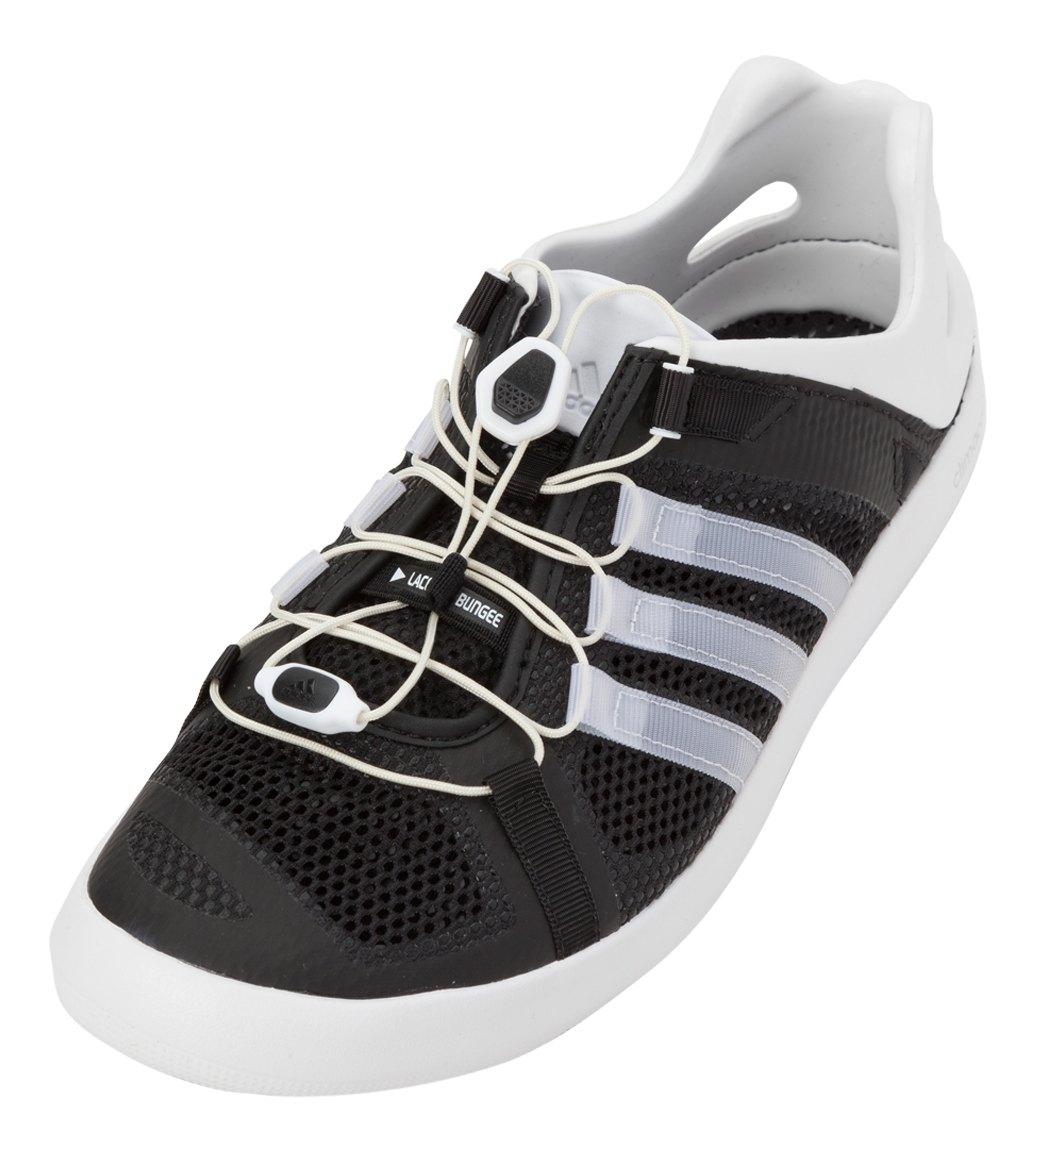 ff344d647d05 Adidas Men s Climacool Boat Breeze Water Shoes at SwimOutlet.com ...